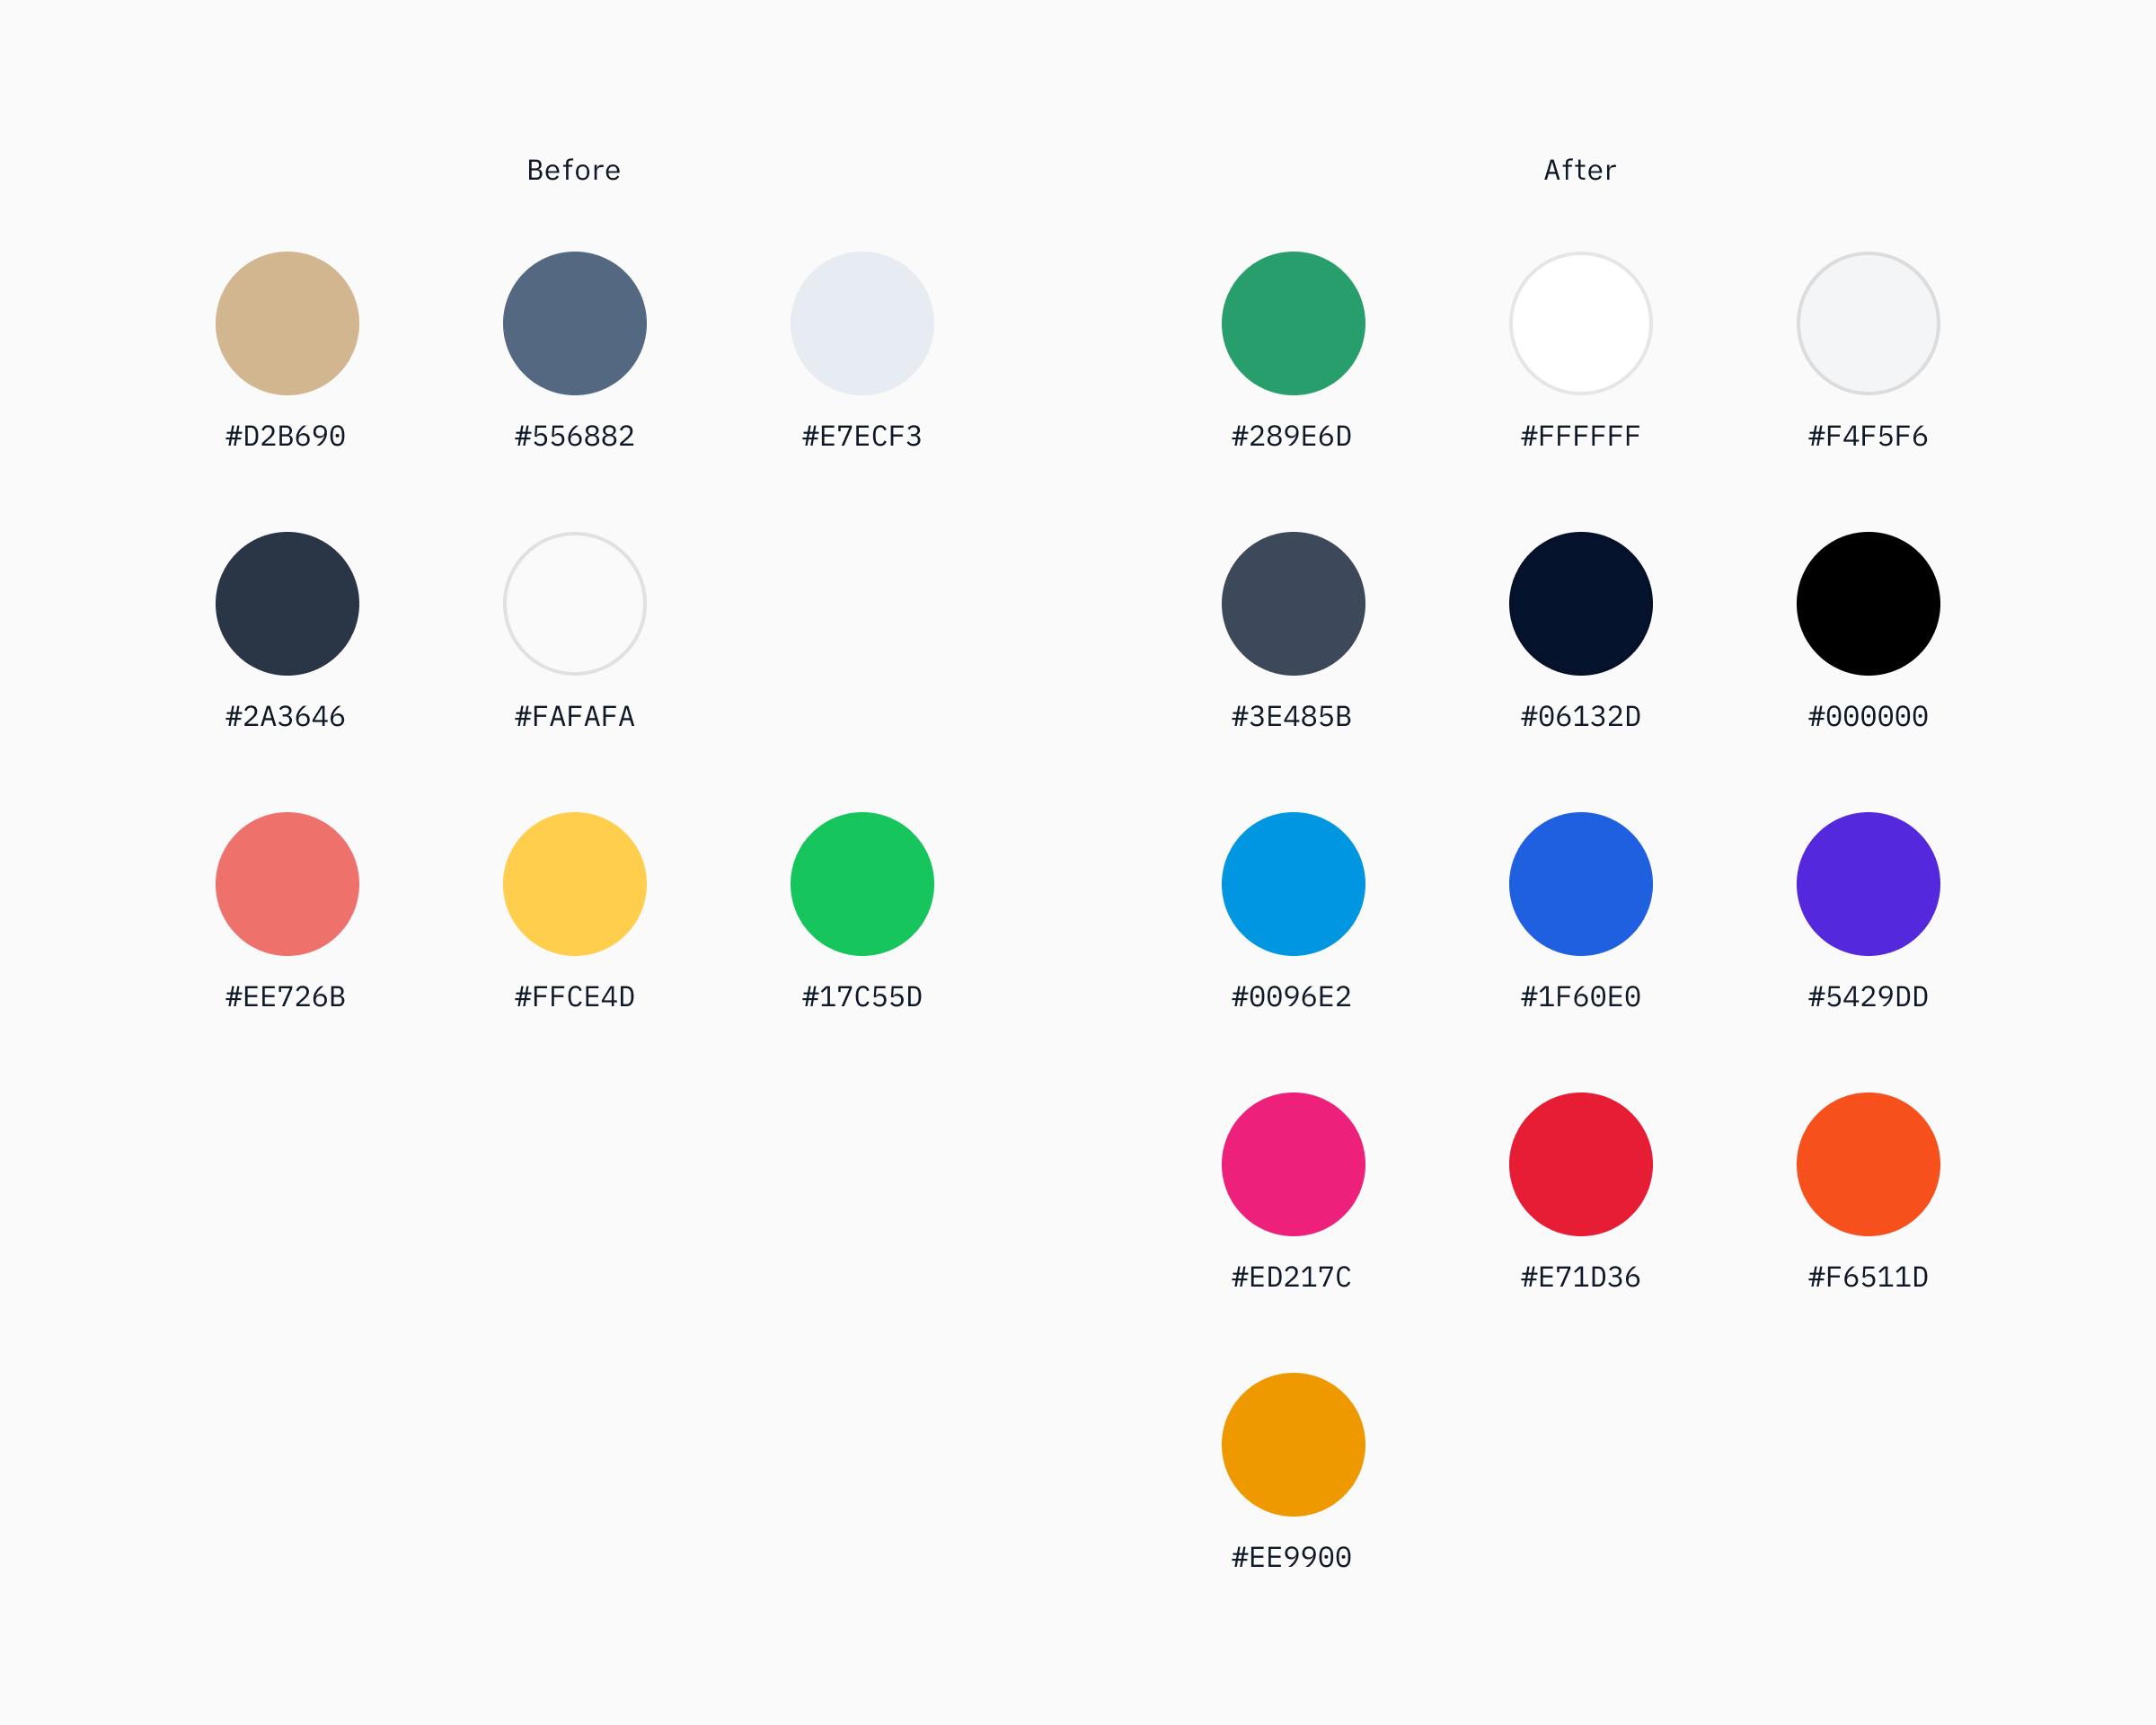 FOSSA's brand color palette